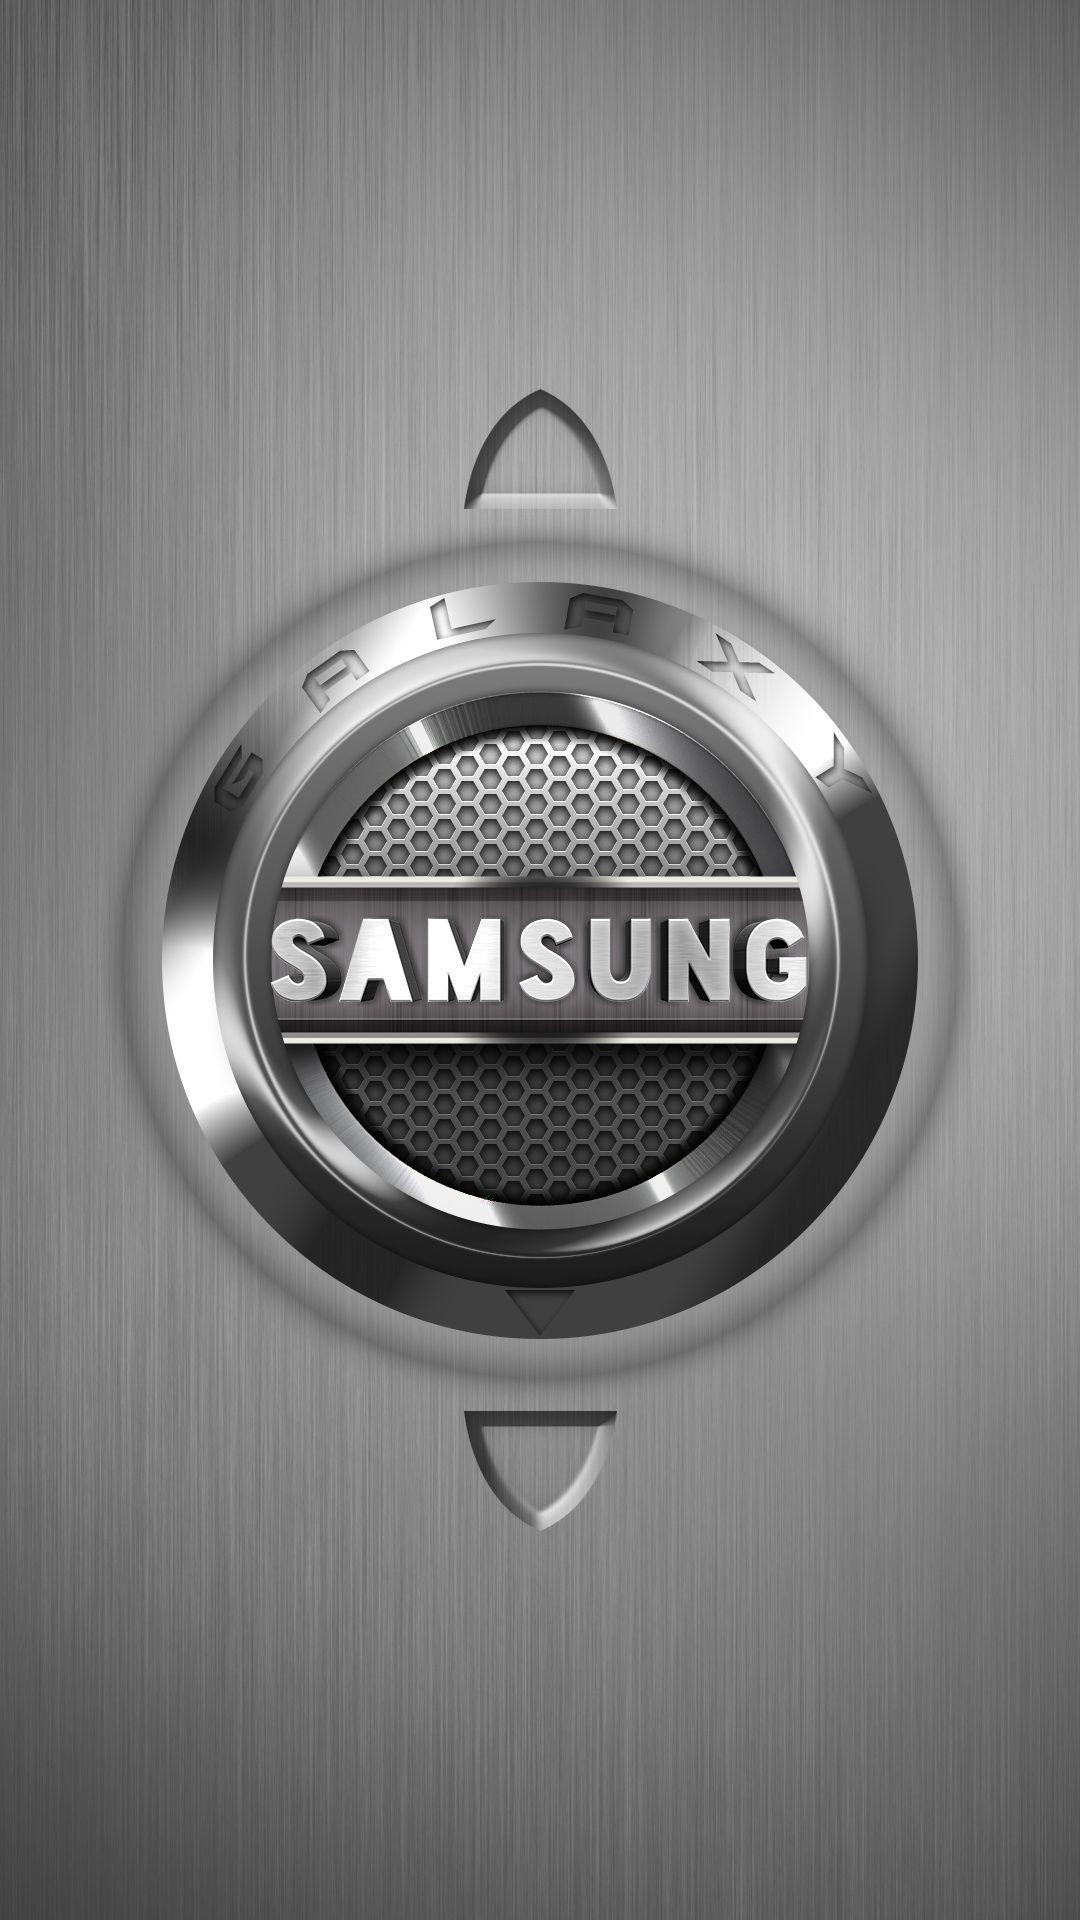 Samsung Imagens